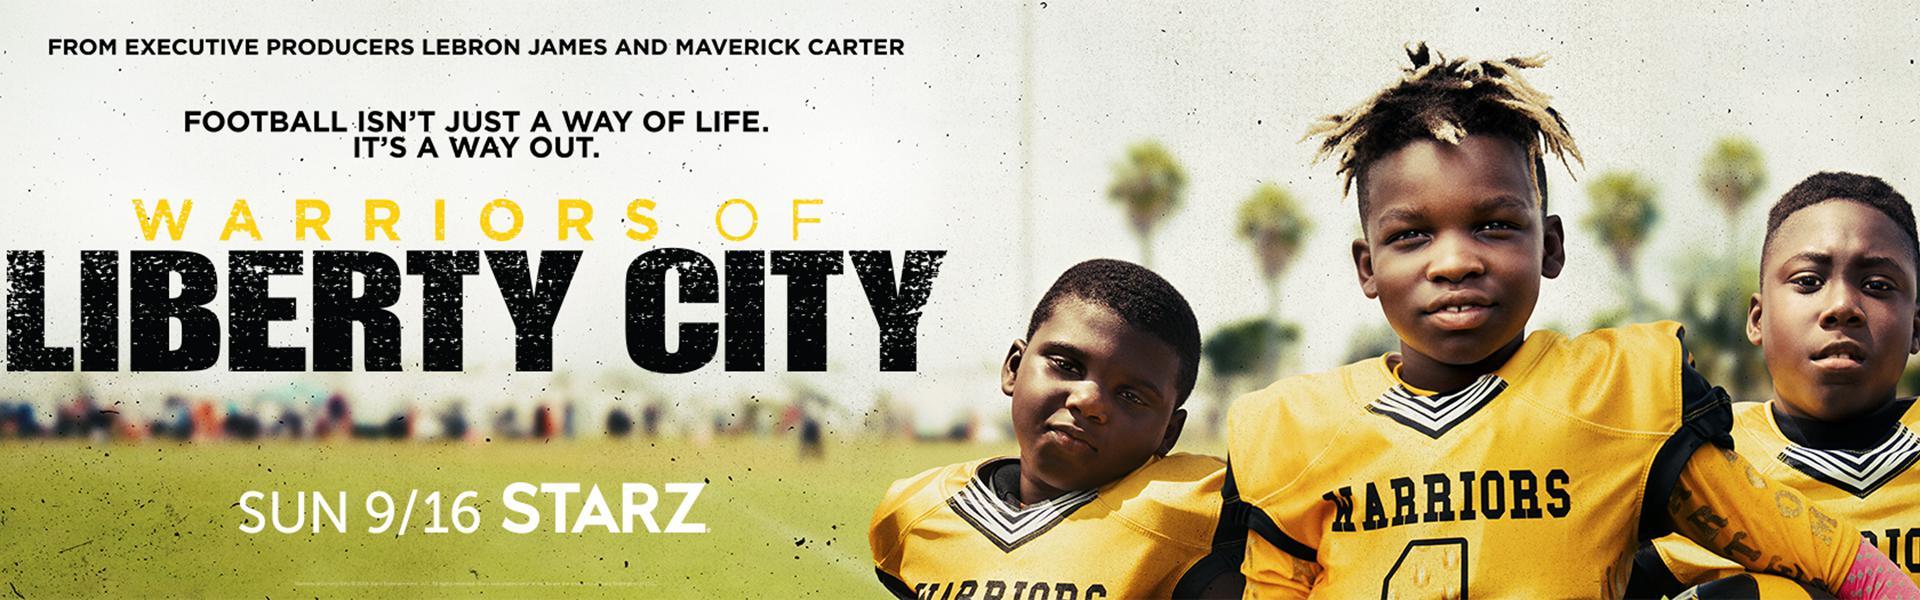 d4a15d0d5dc Starz Teases  Warriors of Liberty City  Youth Football Docuseries ...